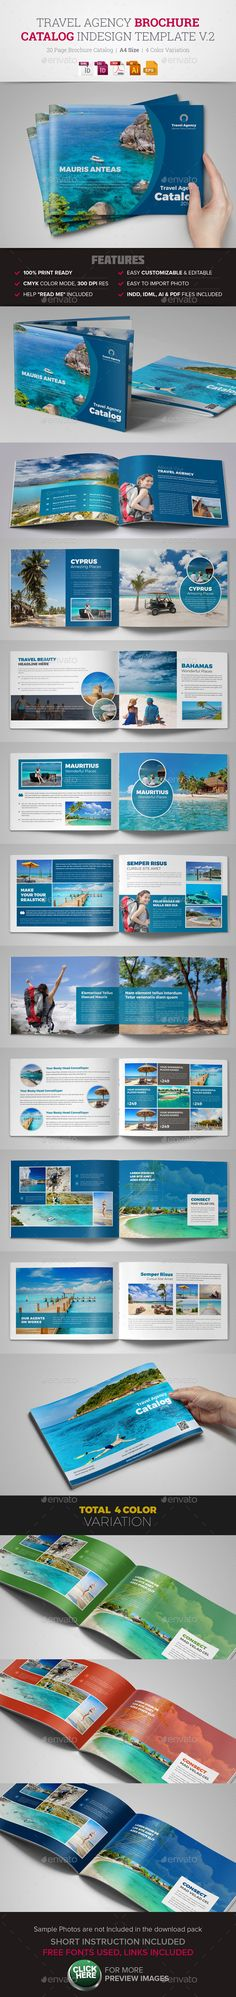 Travel Agency Brochure Catalog InDesign 2 - Corporate Brochures